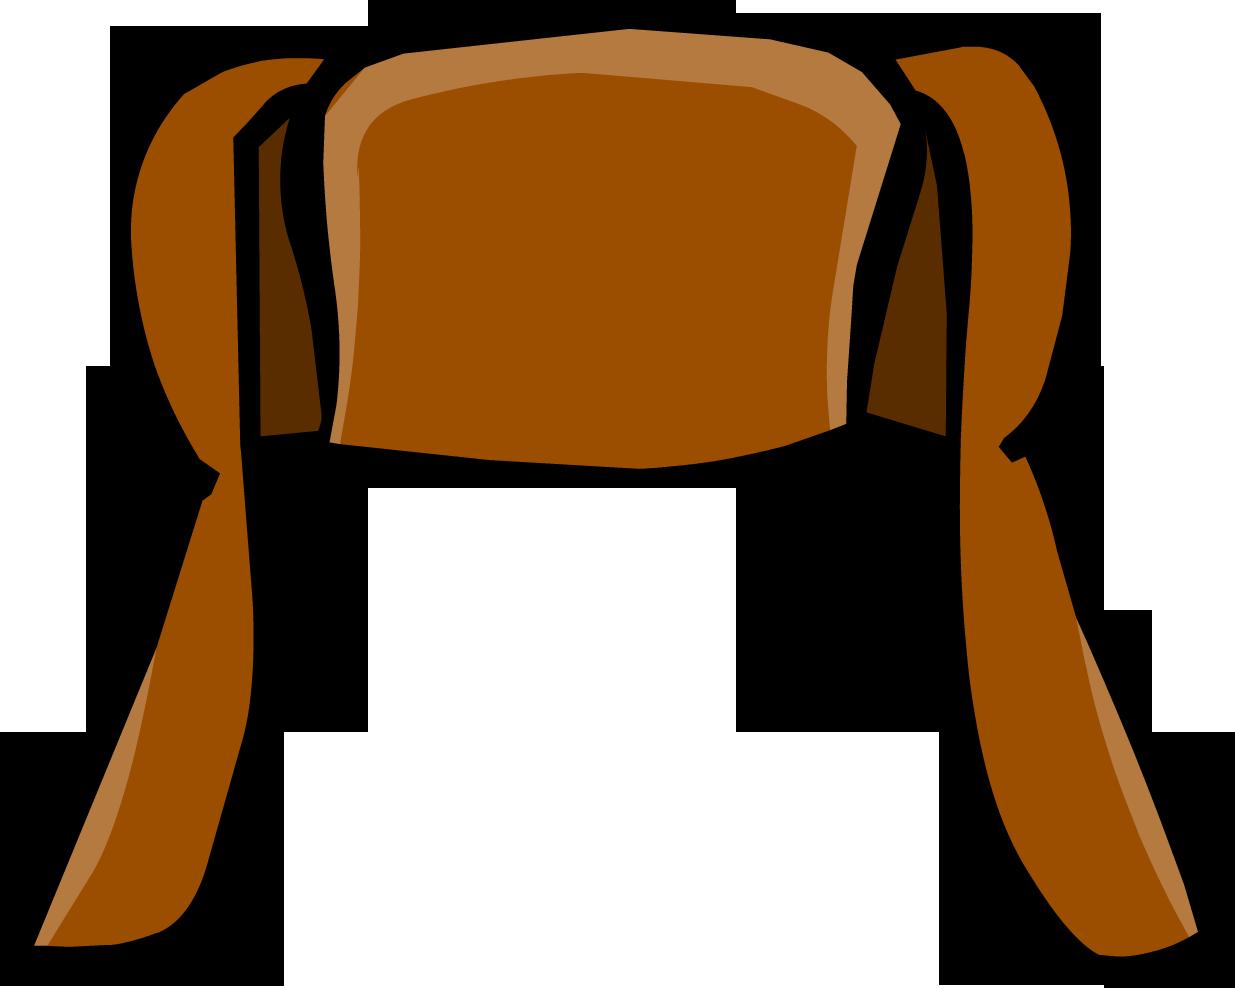 free download Image russian hat clothing. Ushanka transparent clip art